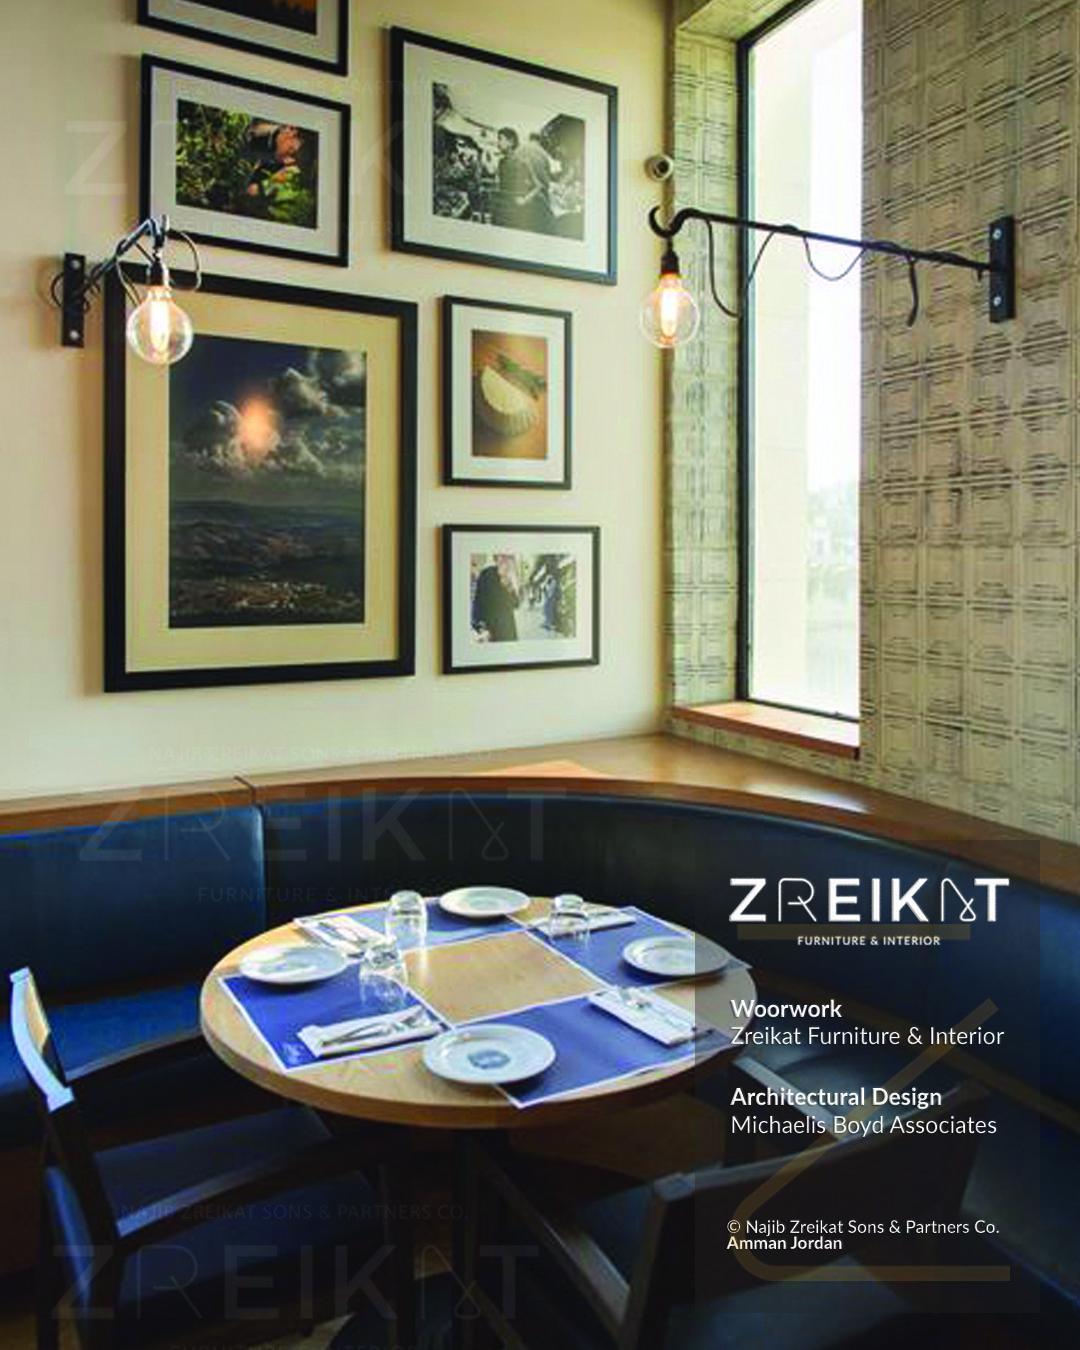 Design Details Woodwork Zreikat Furniture Interior Architecture Michaelis Boyd Ociates Source